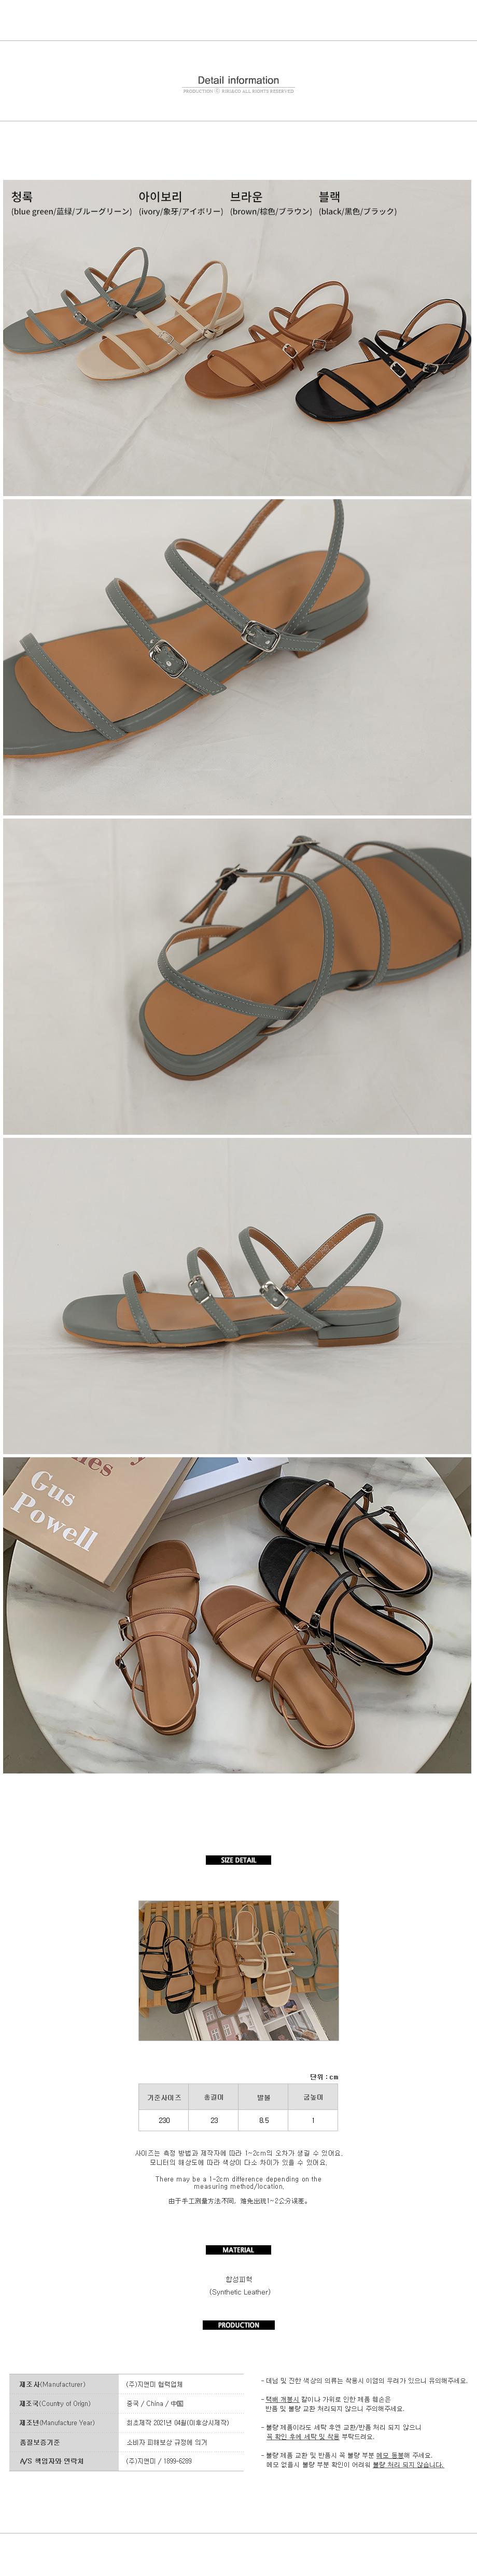 Ponytail strap sandals